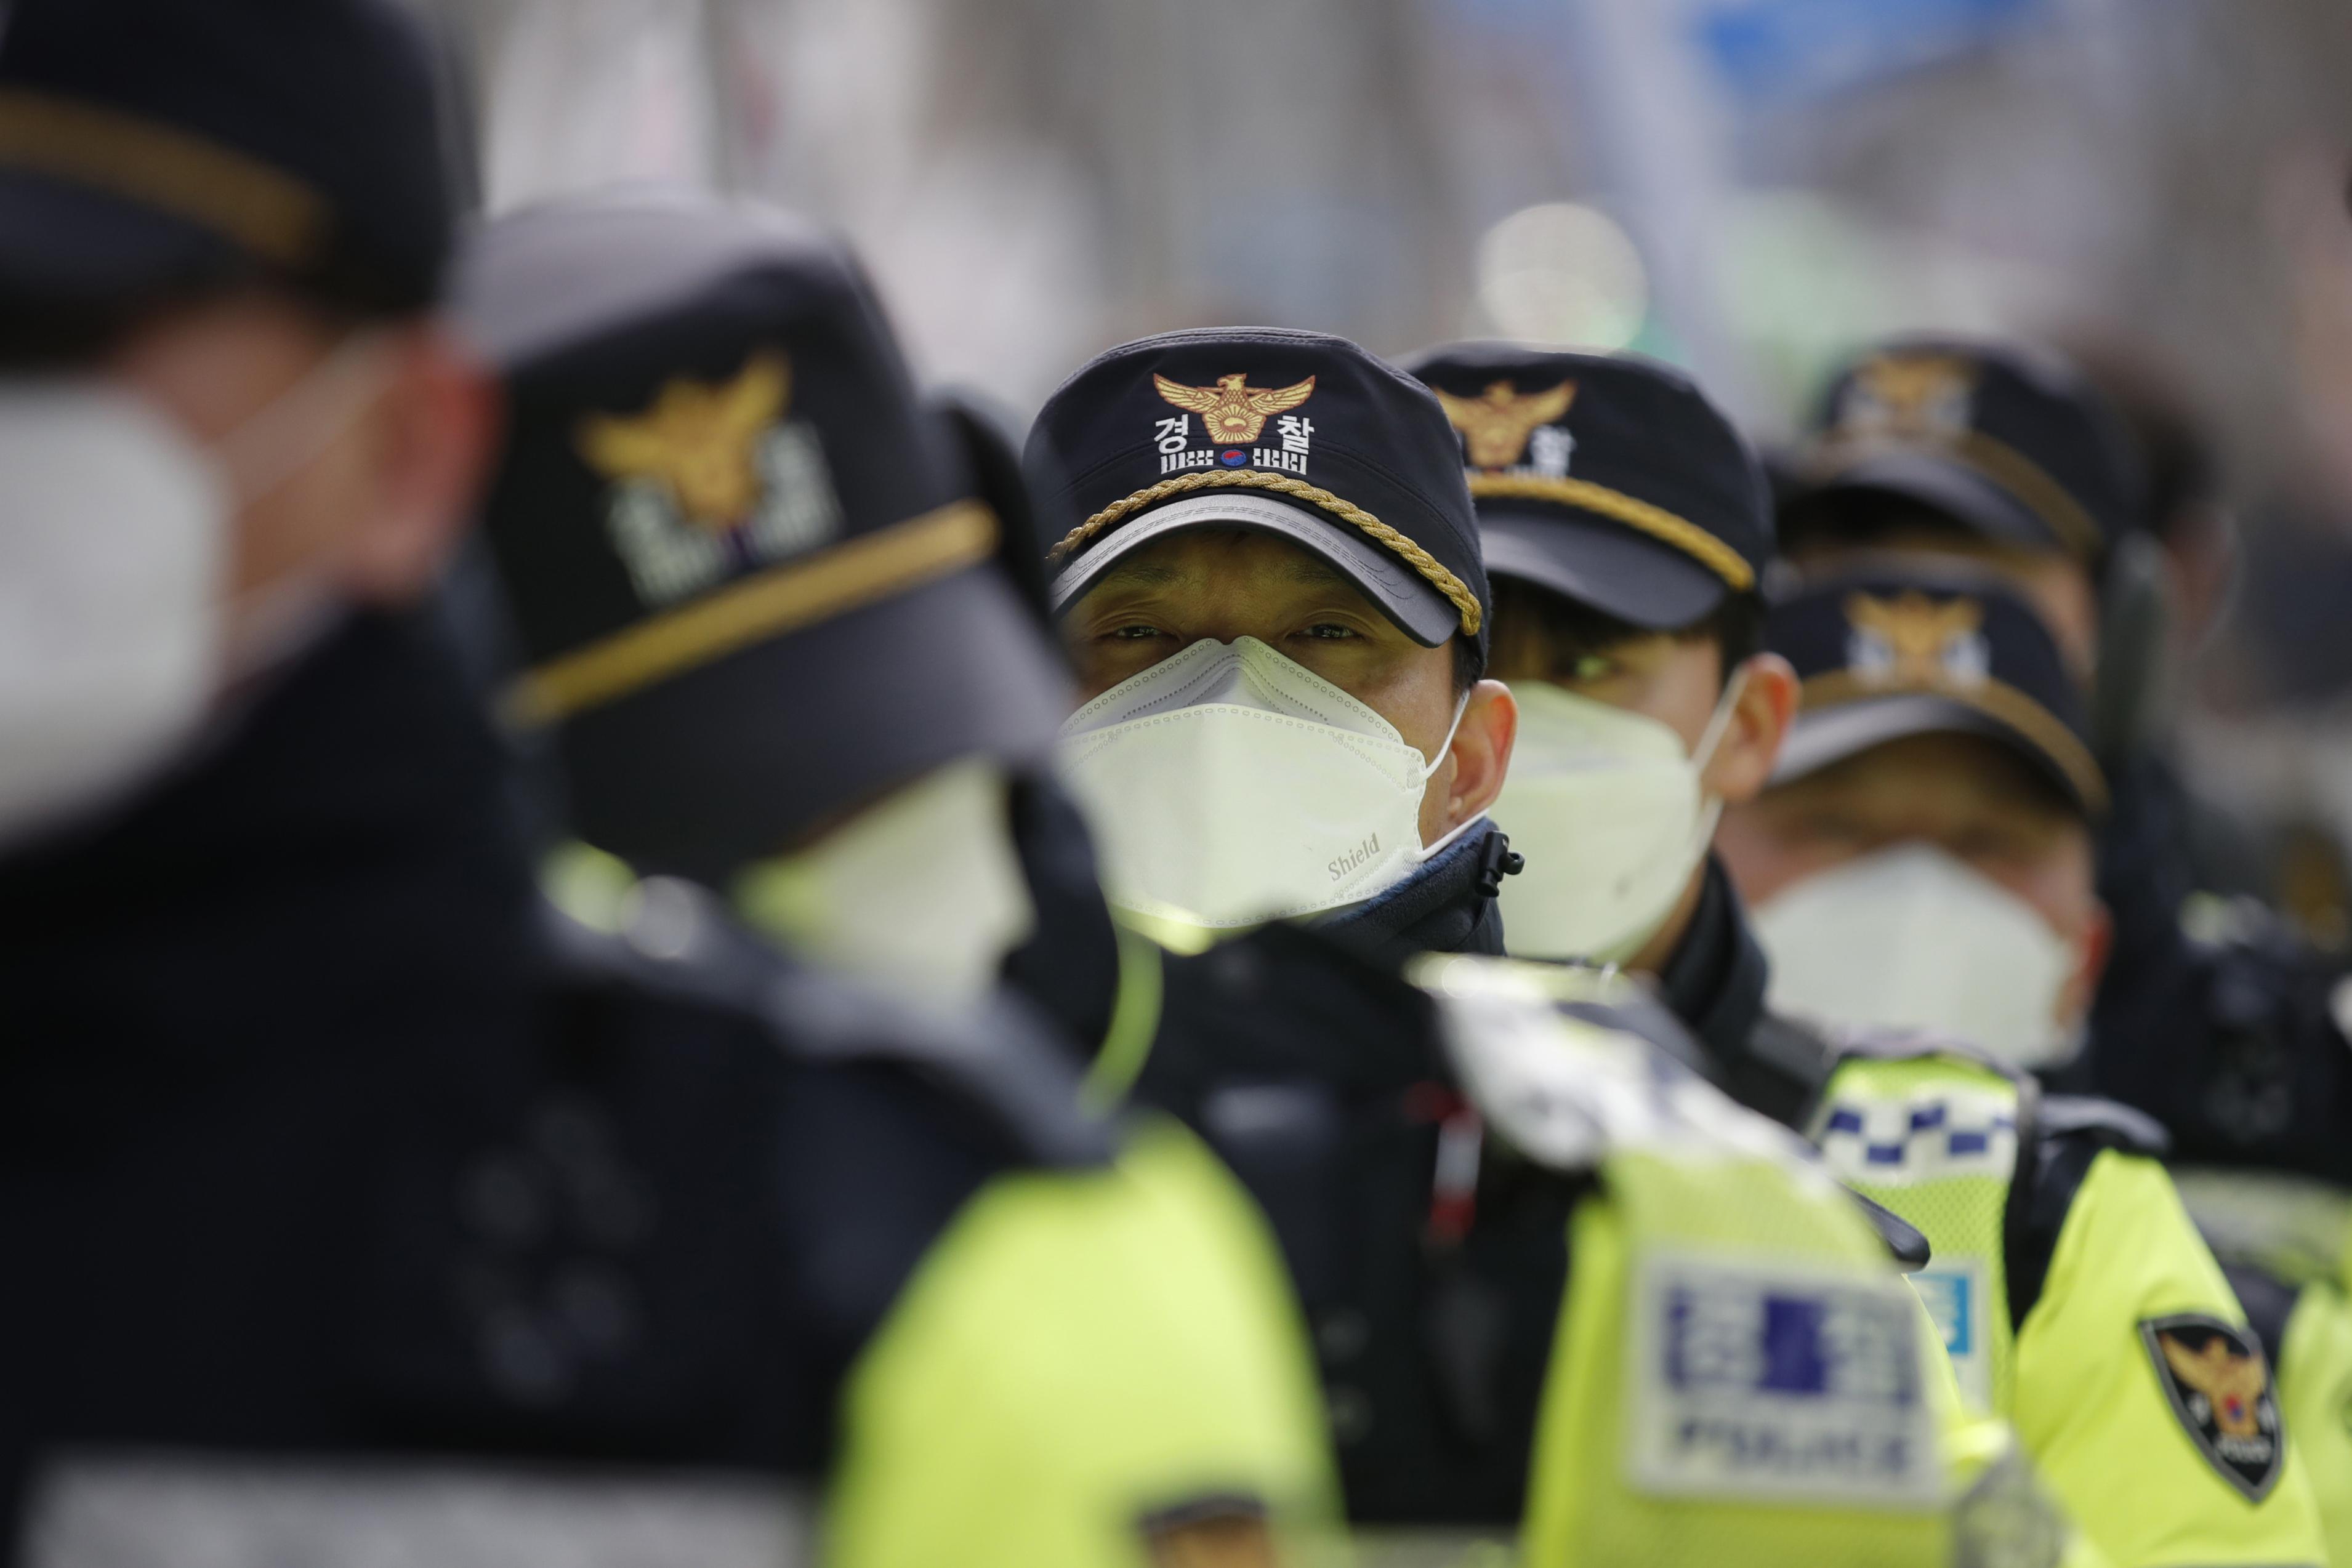 South Korea raises virus alert level to 'highest' as cases surge